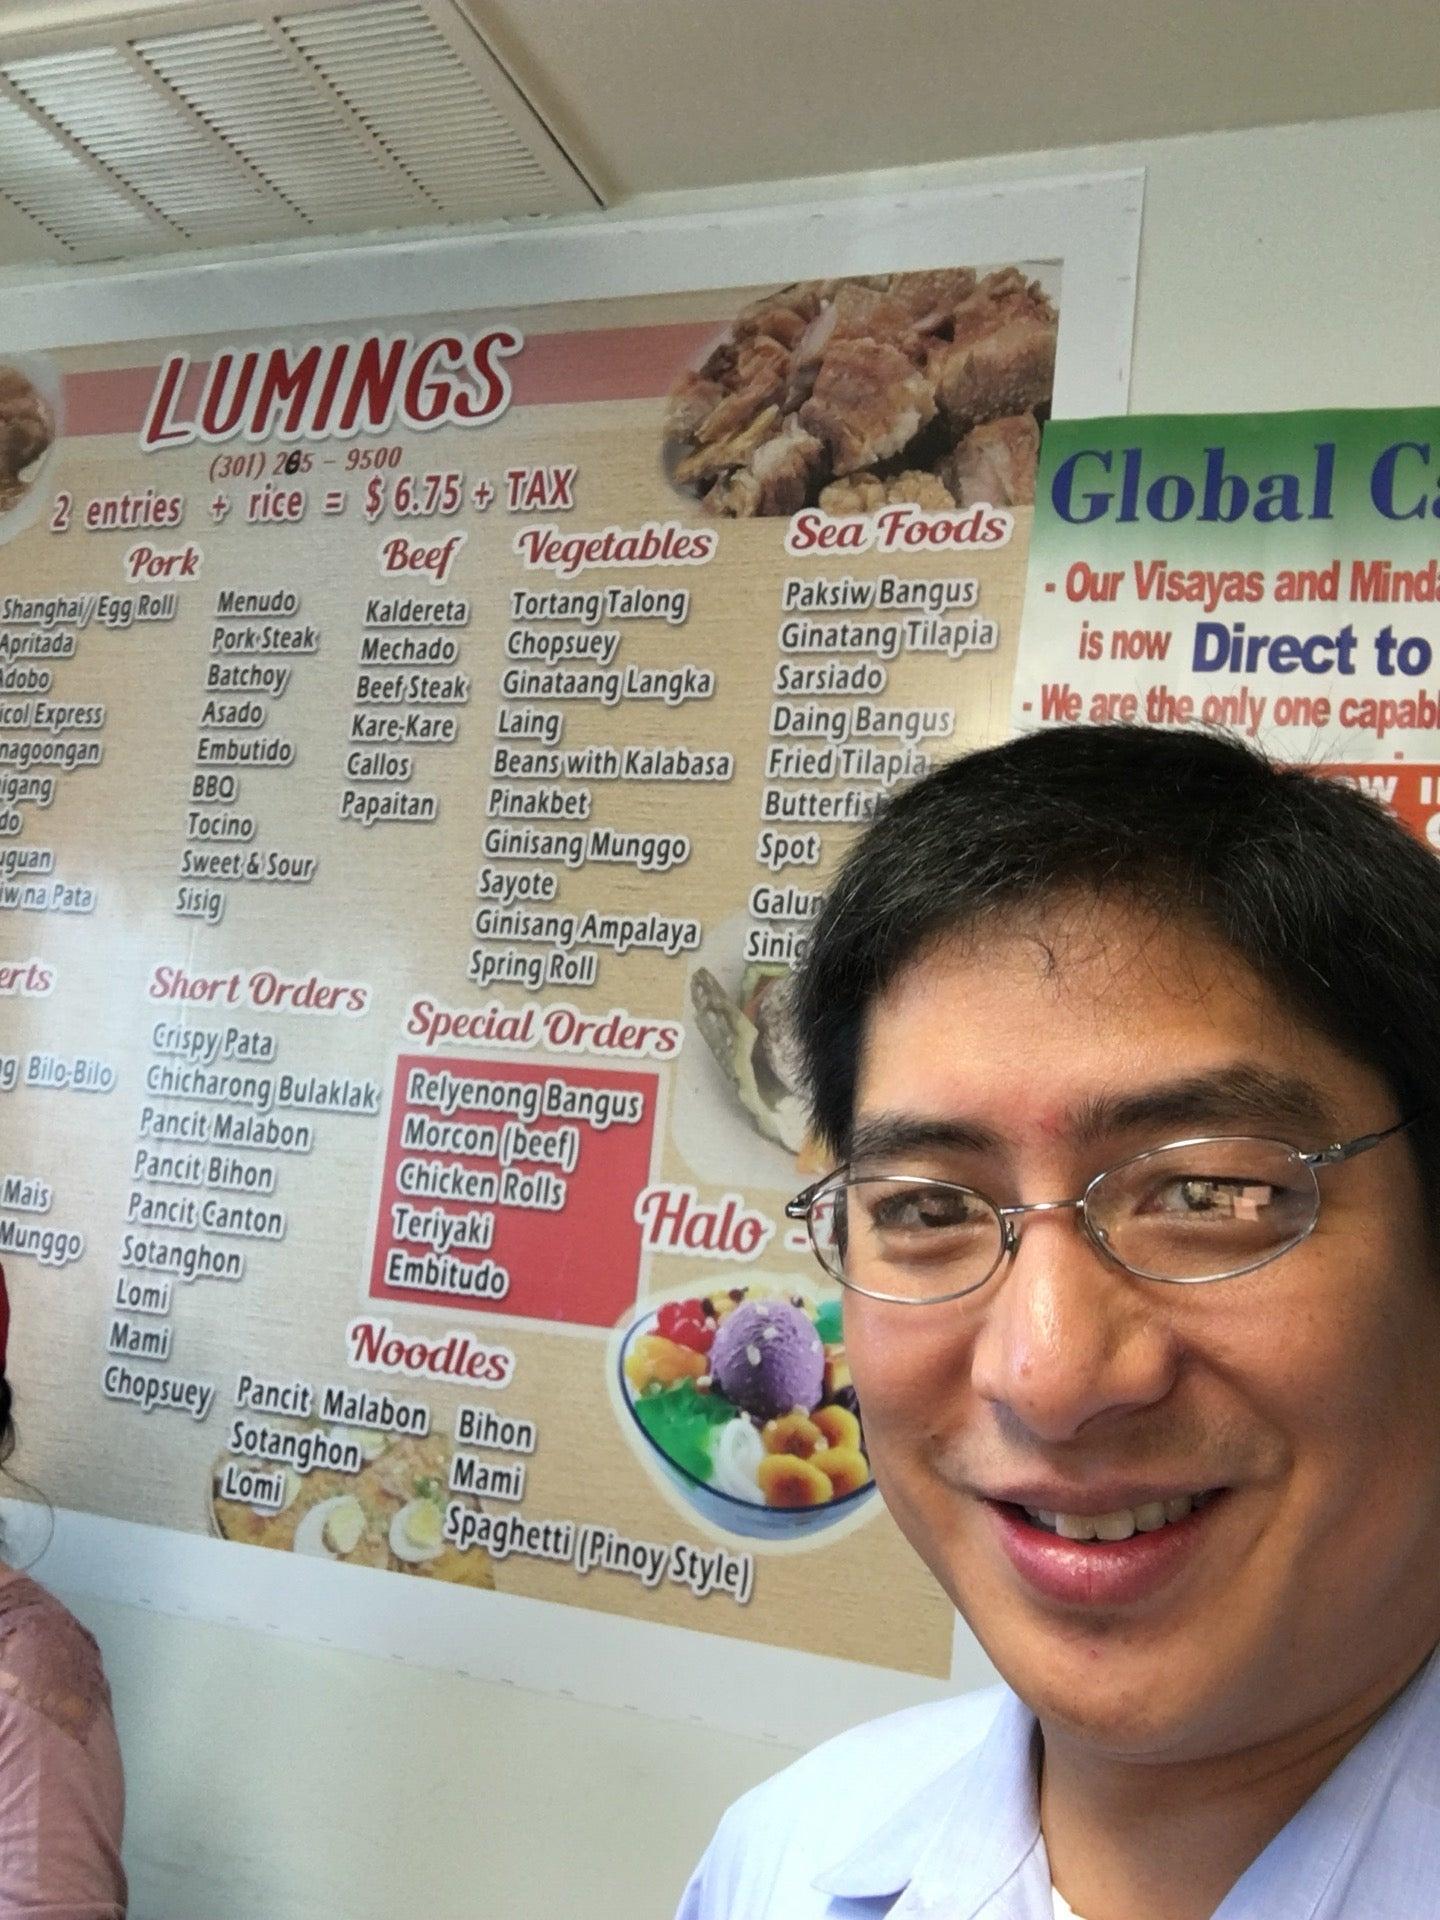 Lumings Llc, catering,filipino food